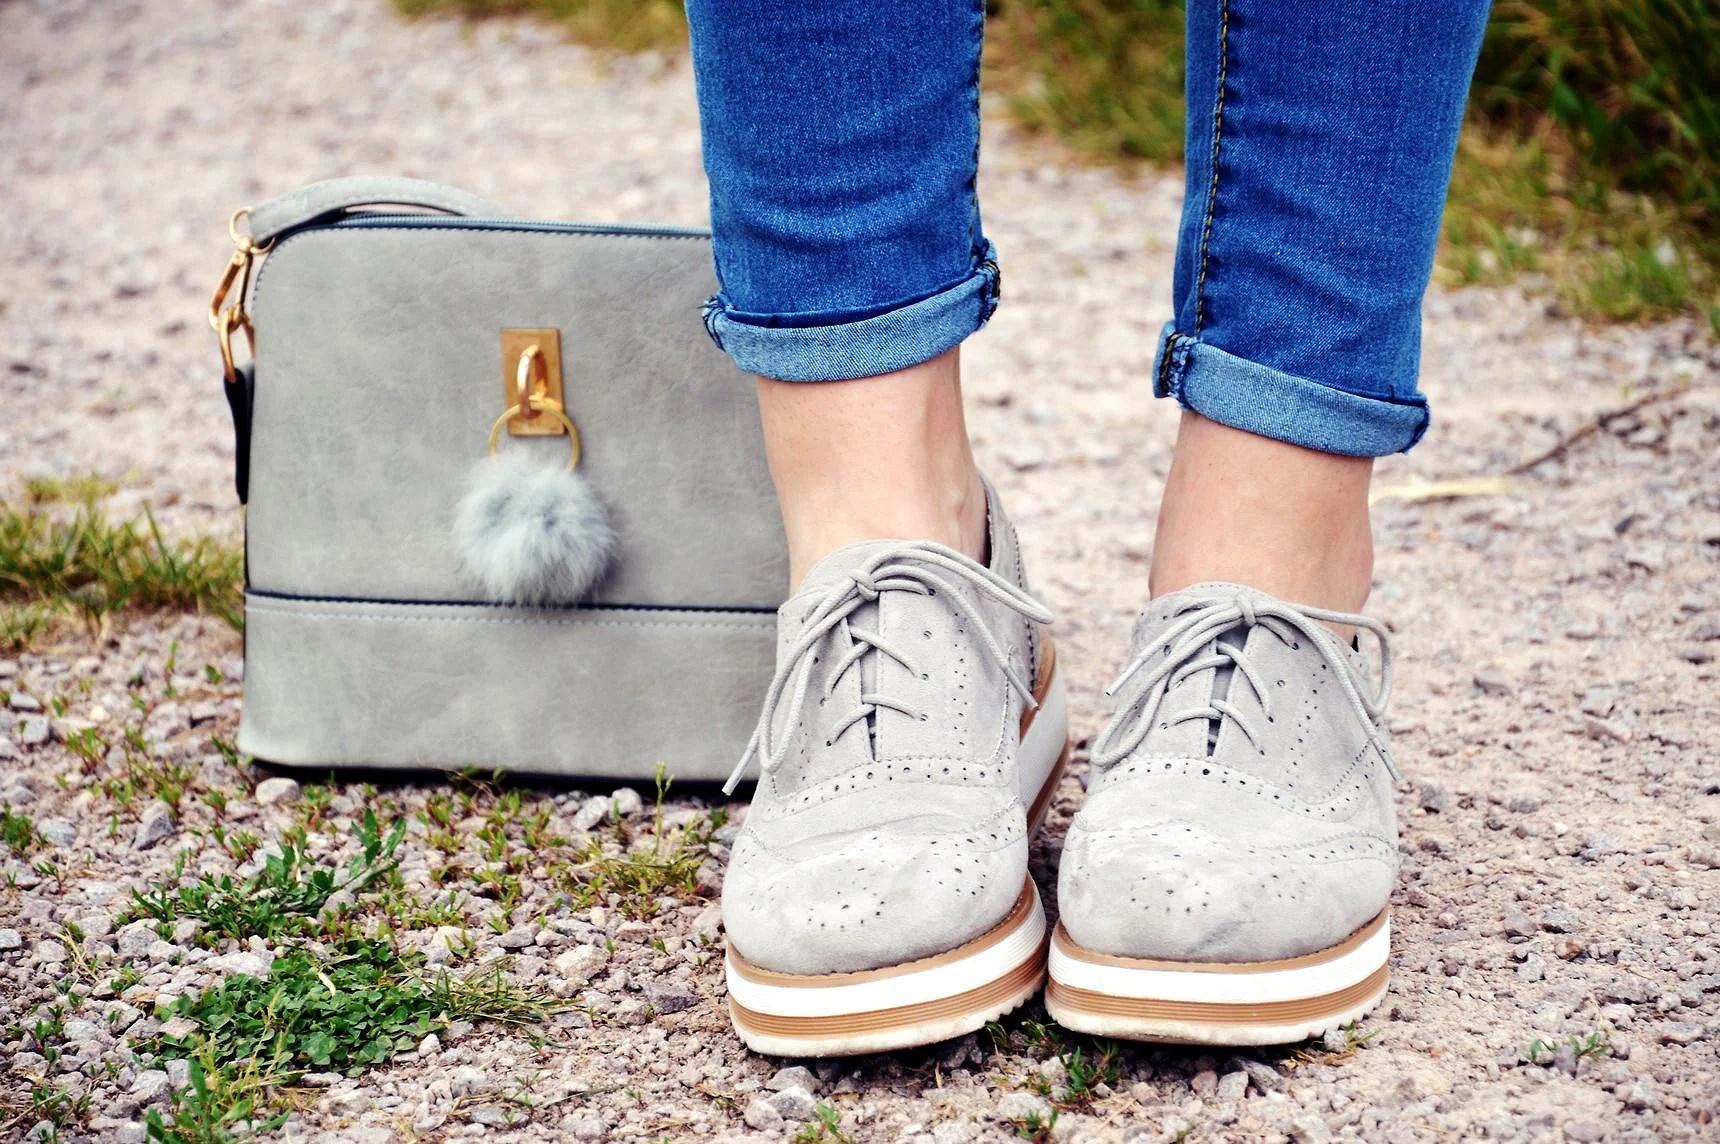 merg, schoes, fashion, mode, magiclovv